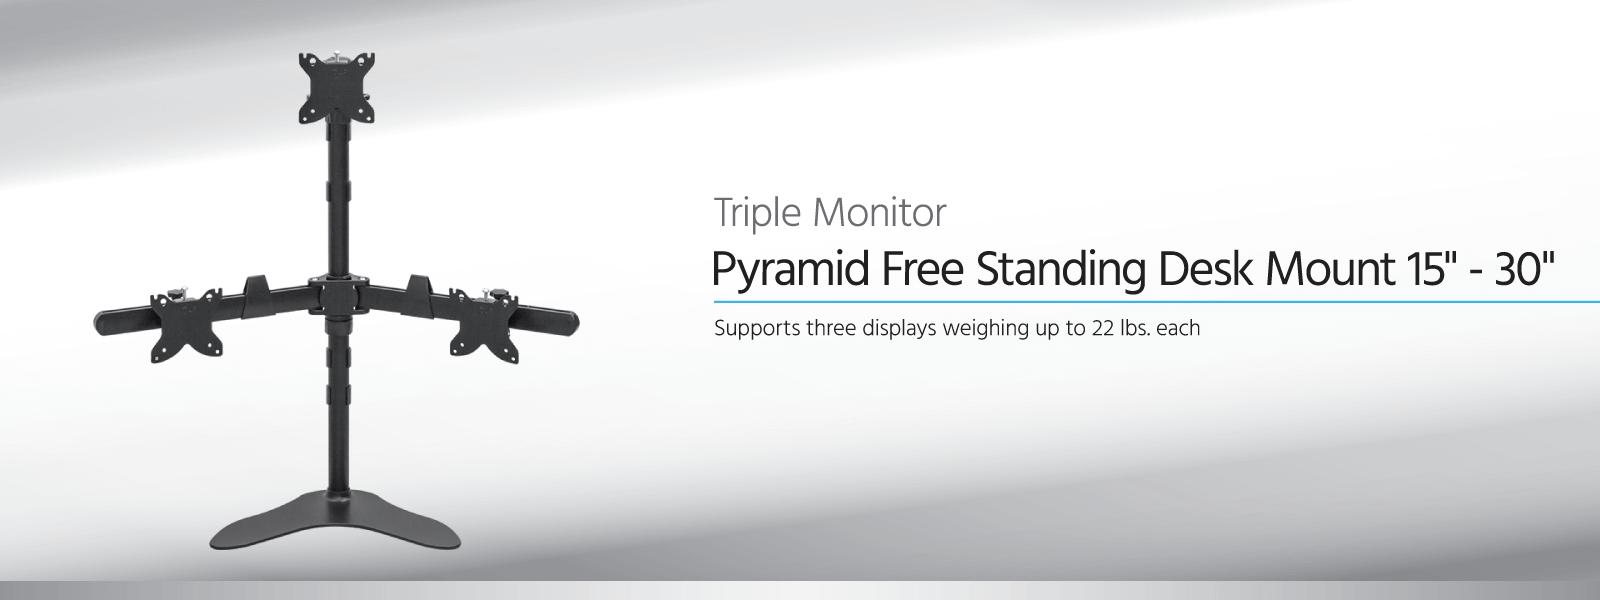 Monoprice Triple Monitor Pyramid Free Standing Desk Mount